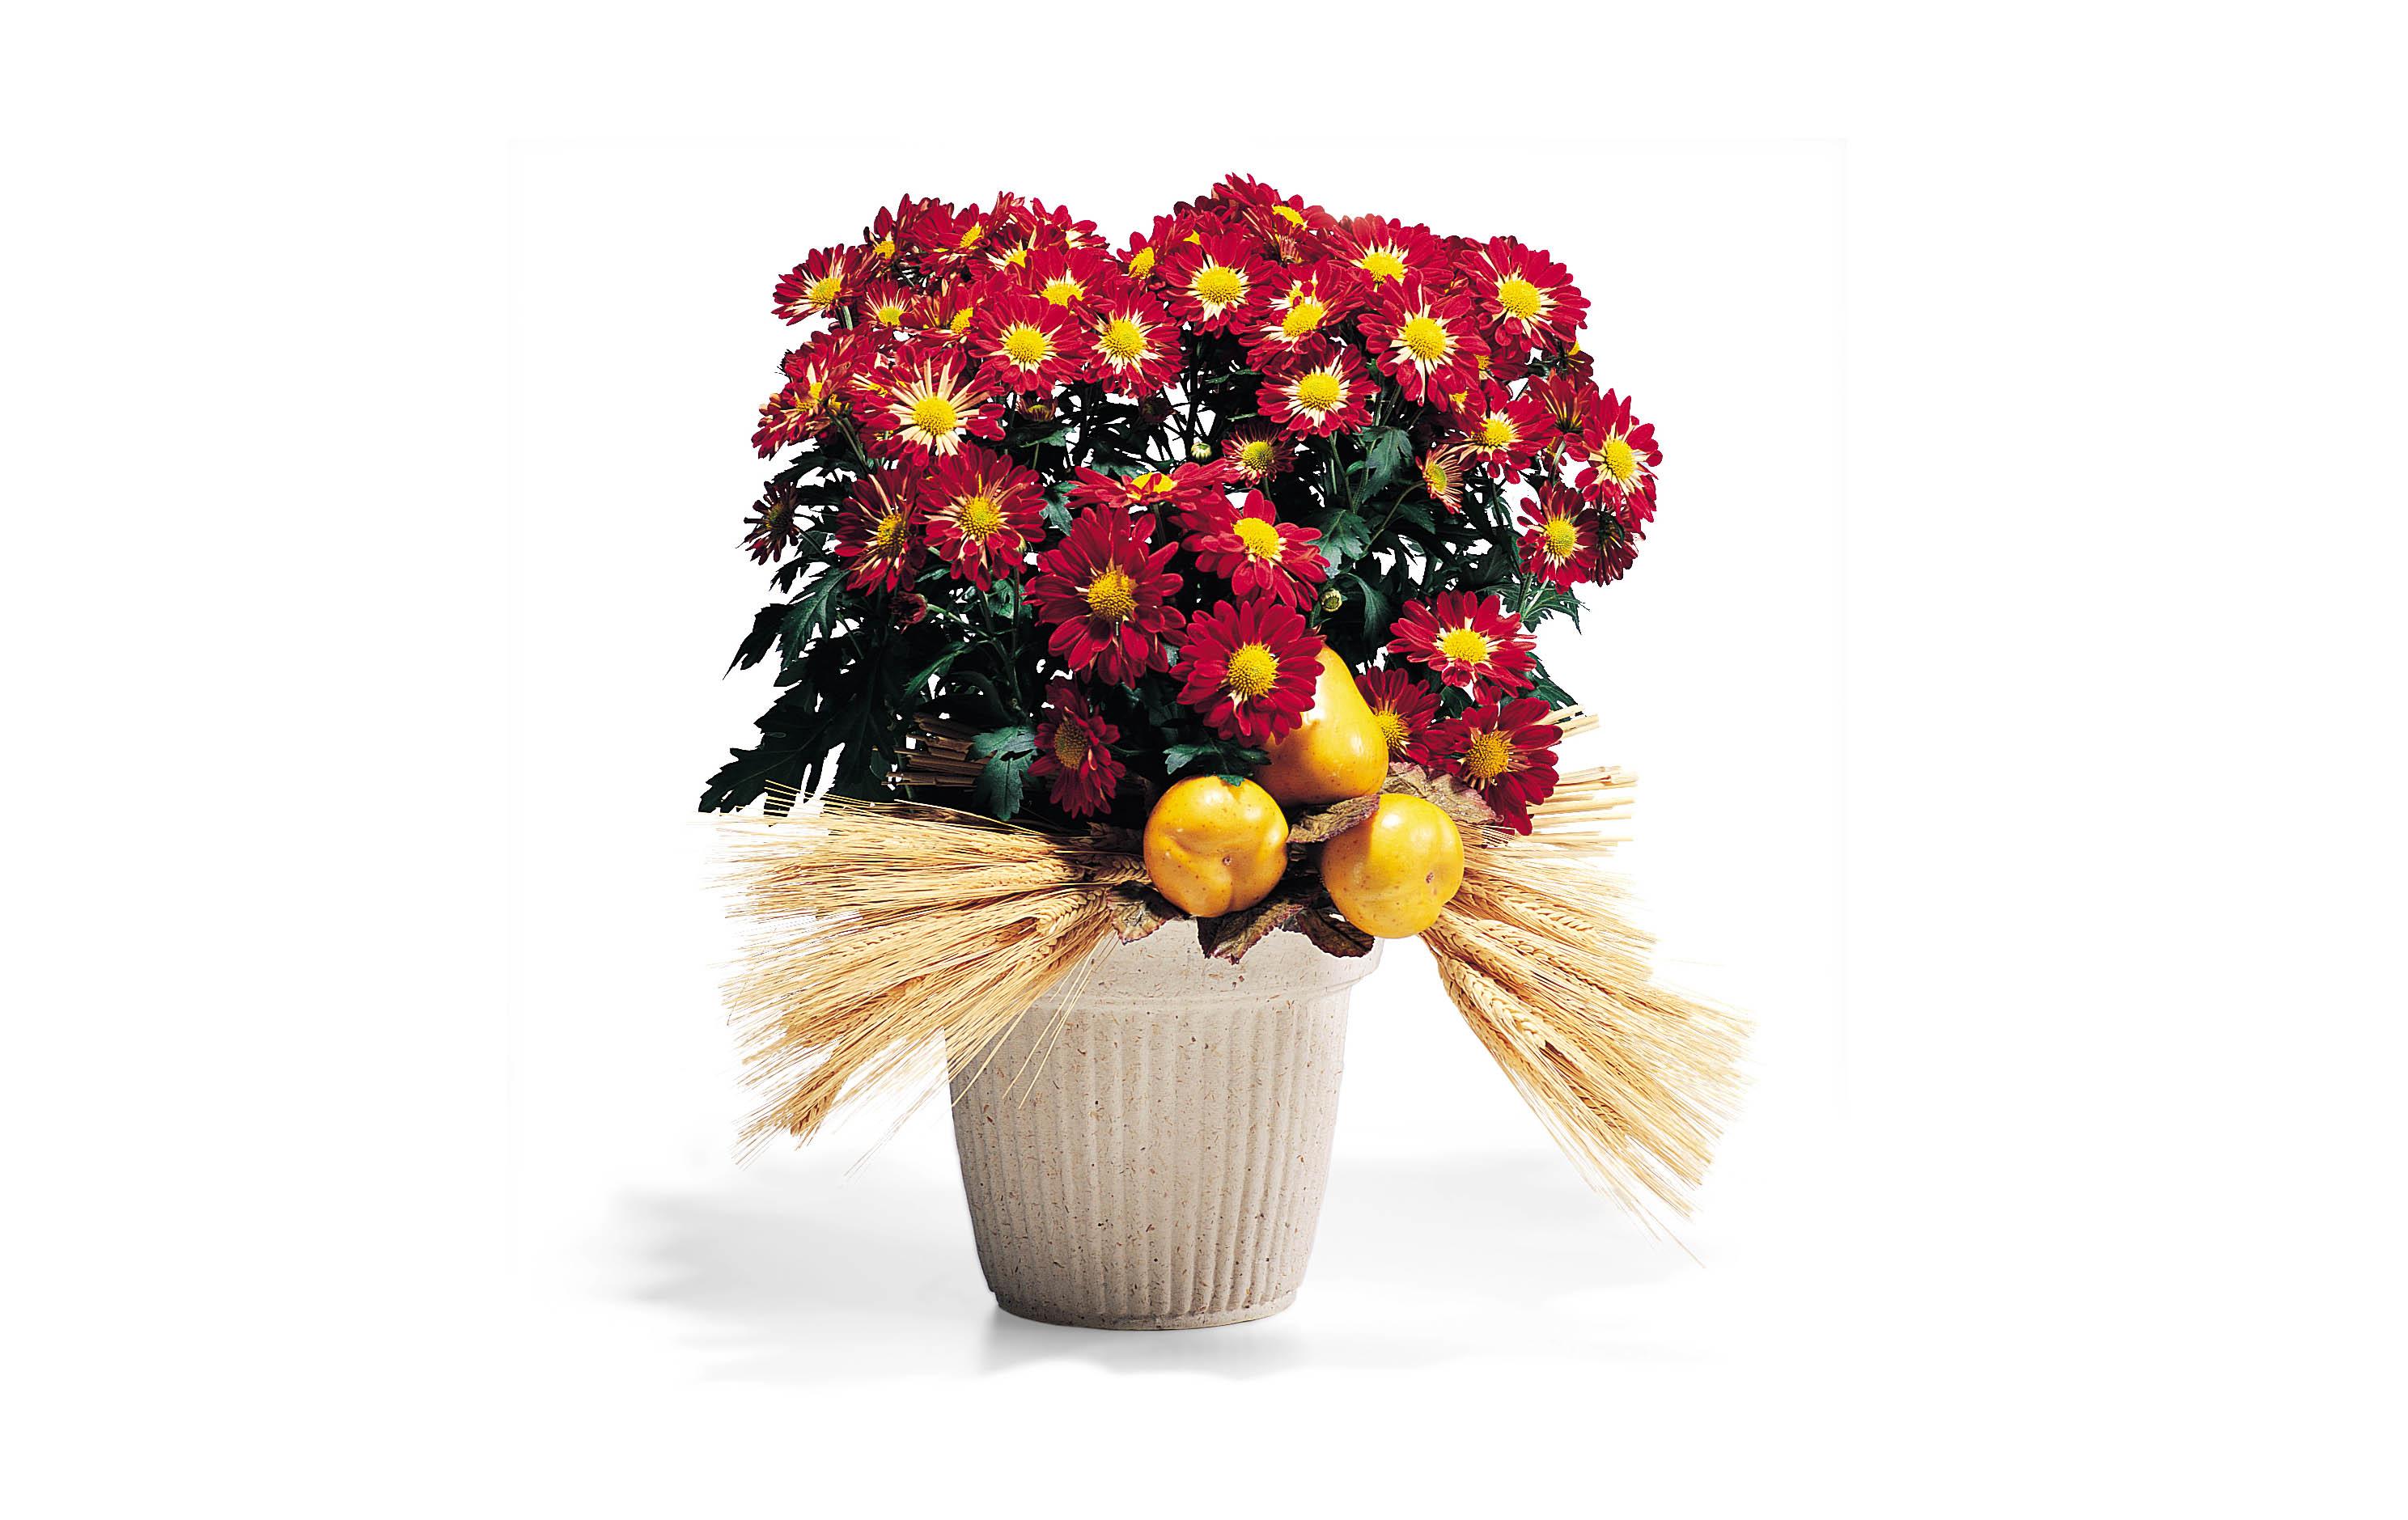 Marigolds in Field Straw